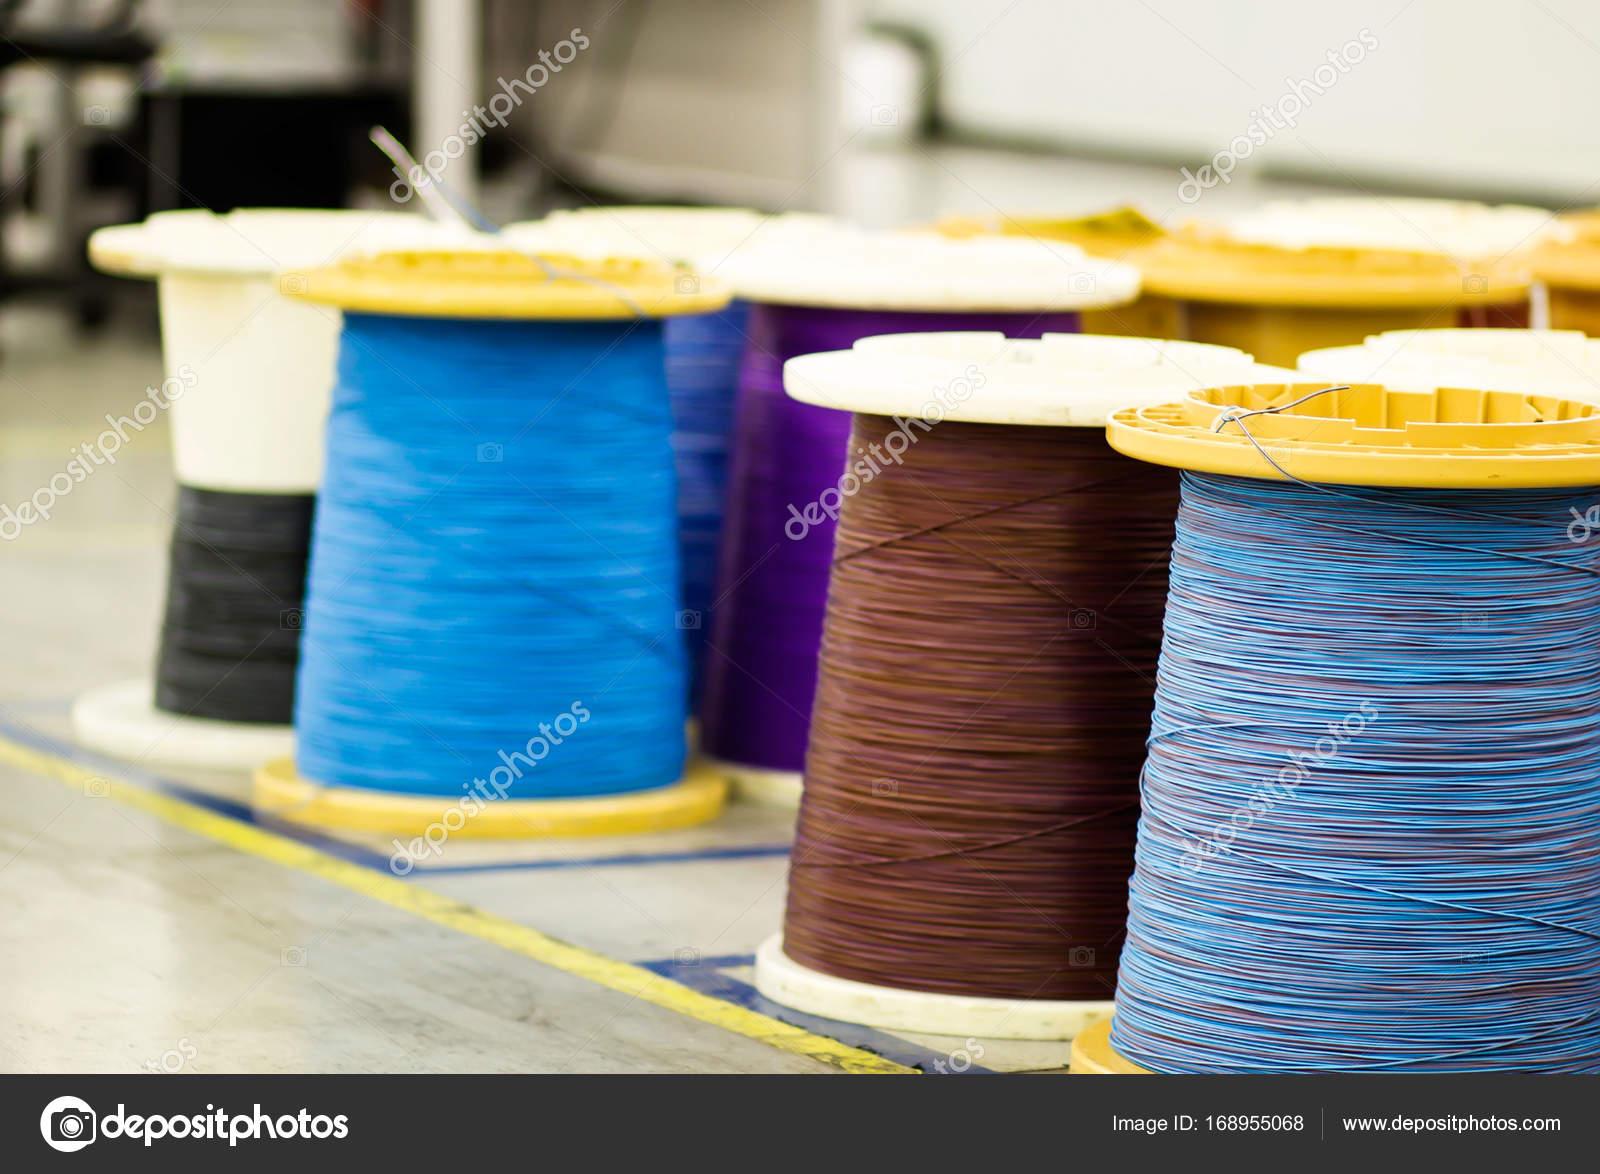 Industrielle Spulen mit Kabel — Stockfoto © MilenneT #168955068